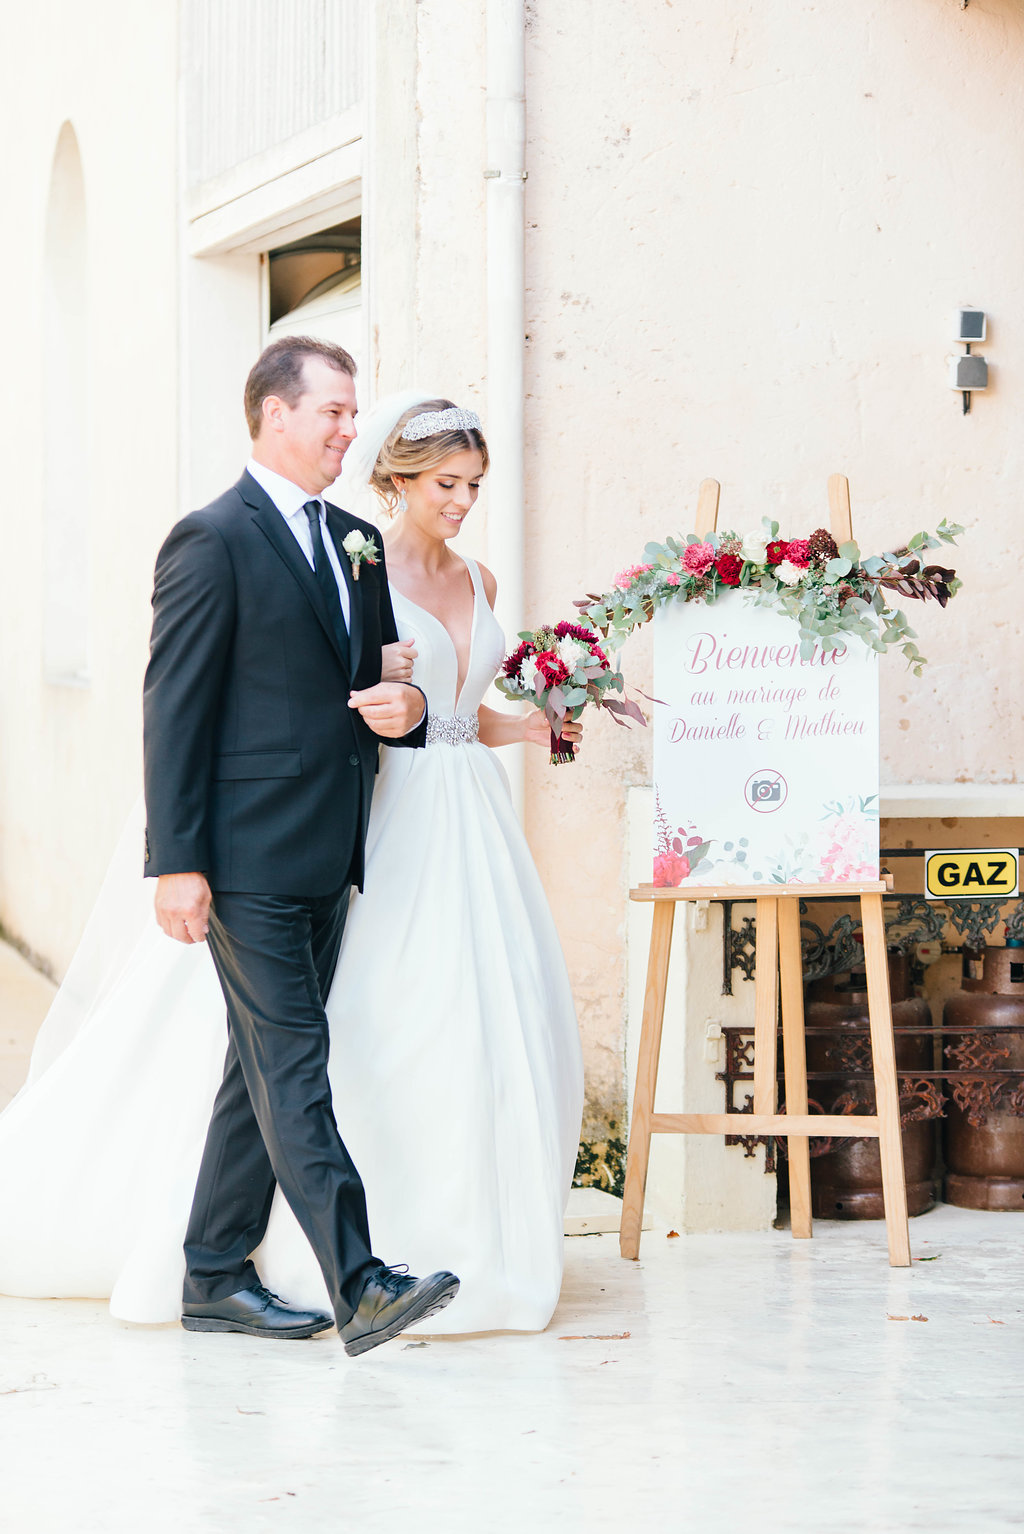 dc0d77c22540 A Fairy Tale Chateau Wedding in Bordeaux